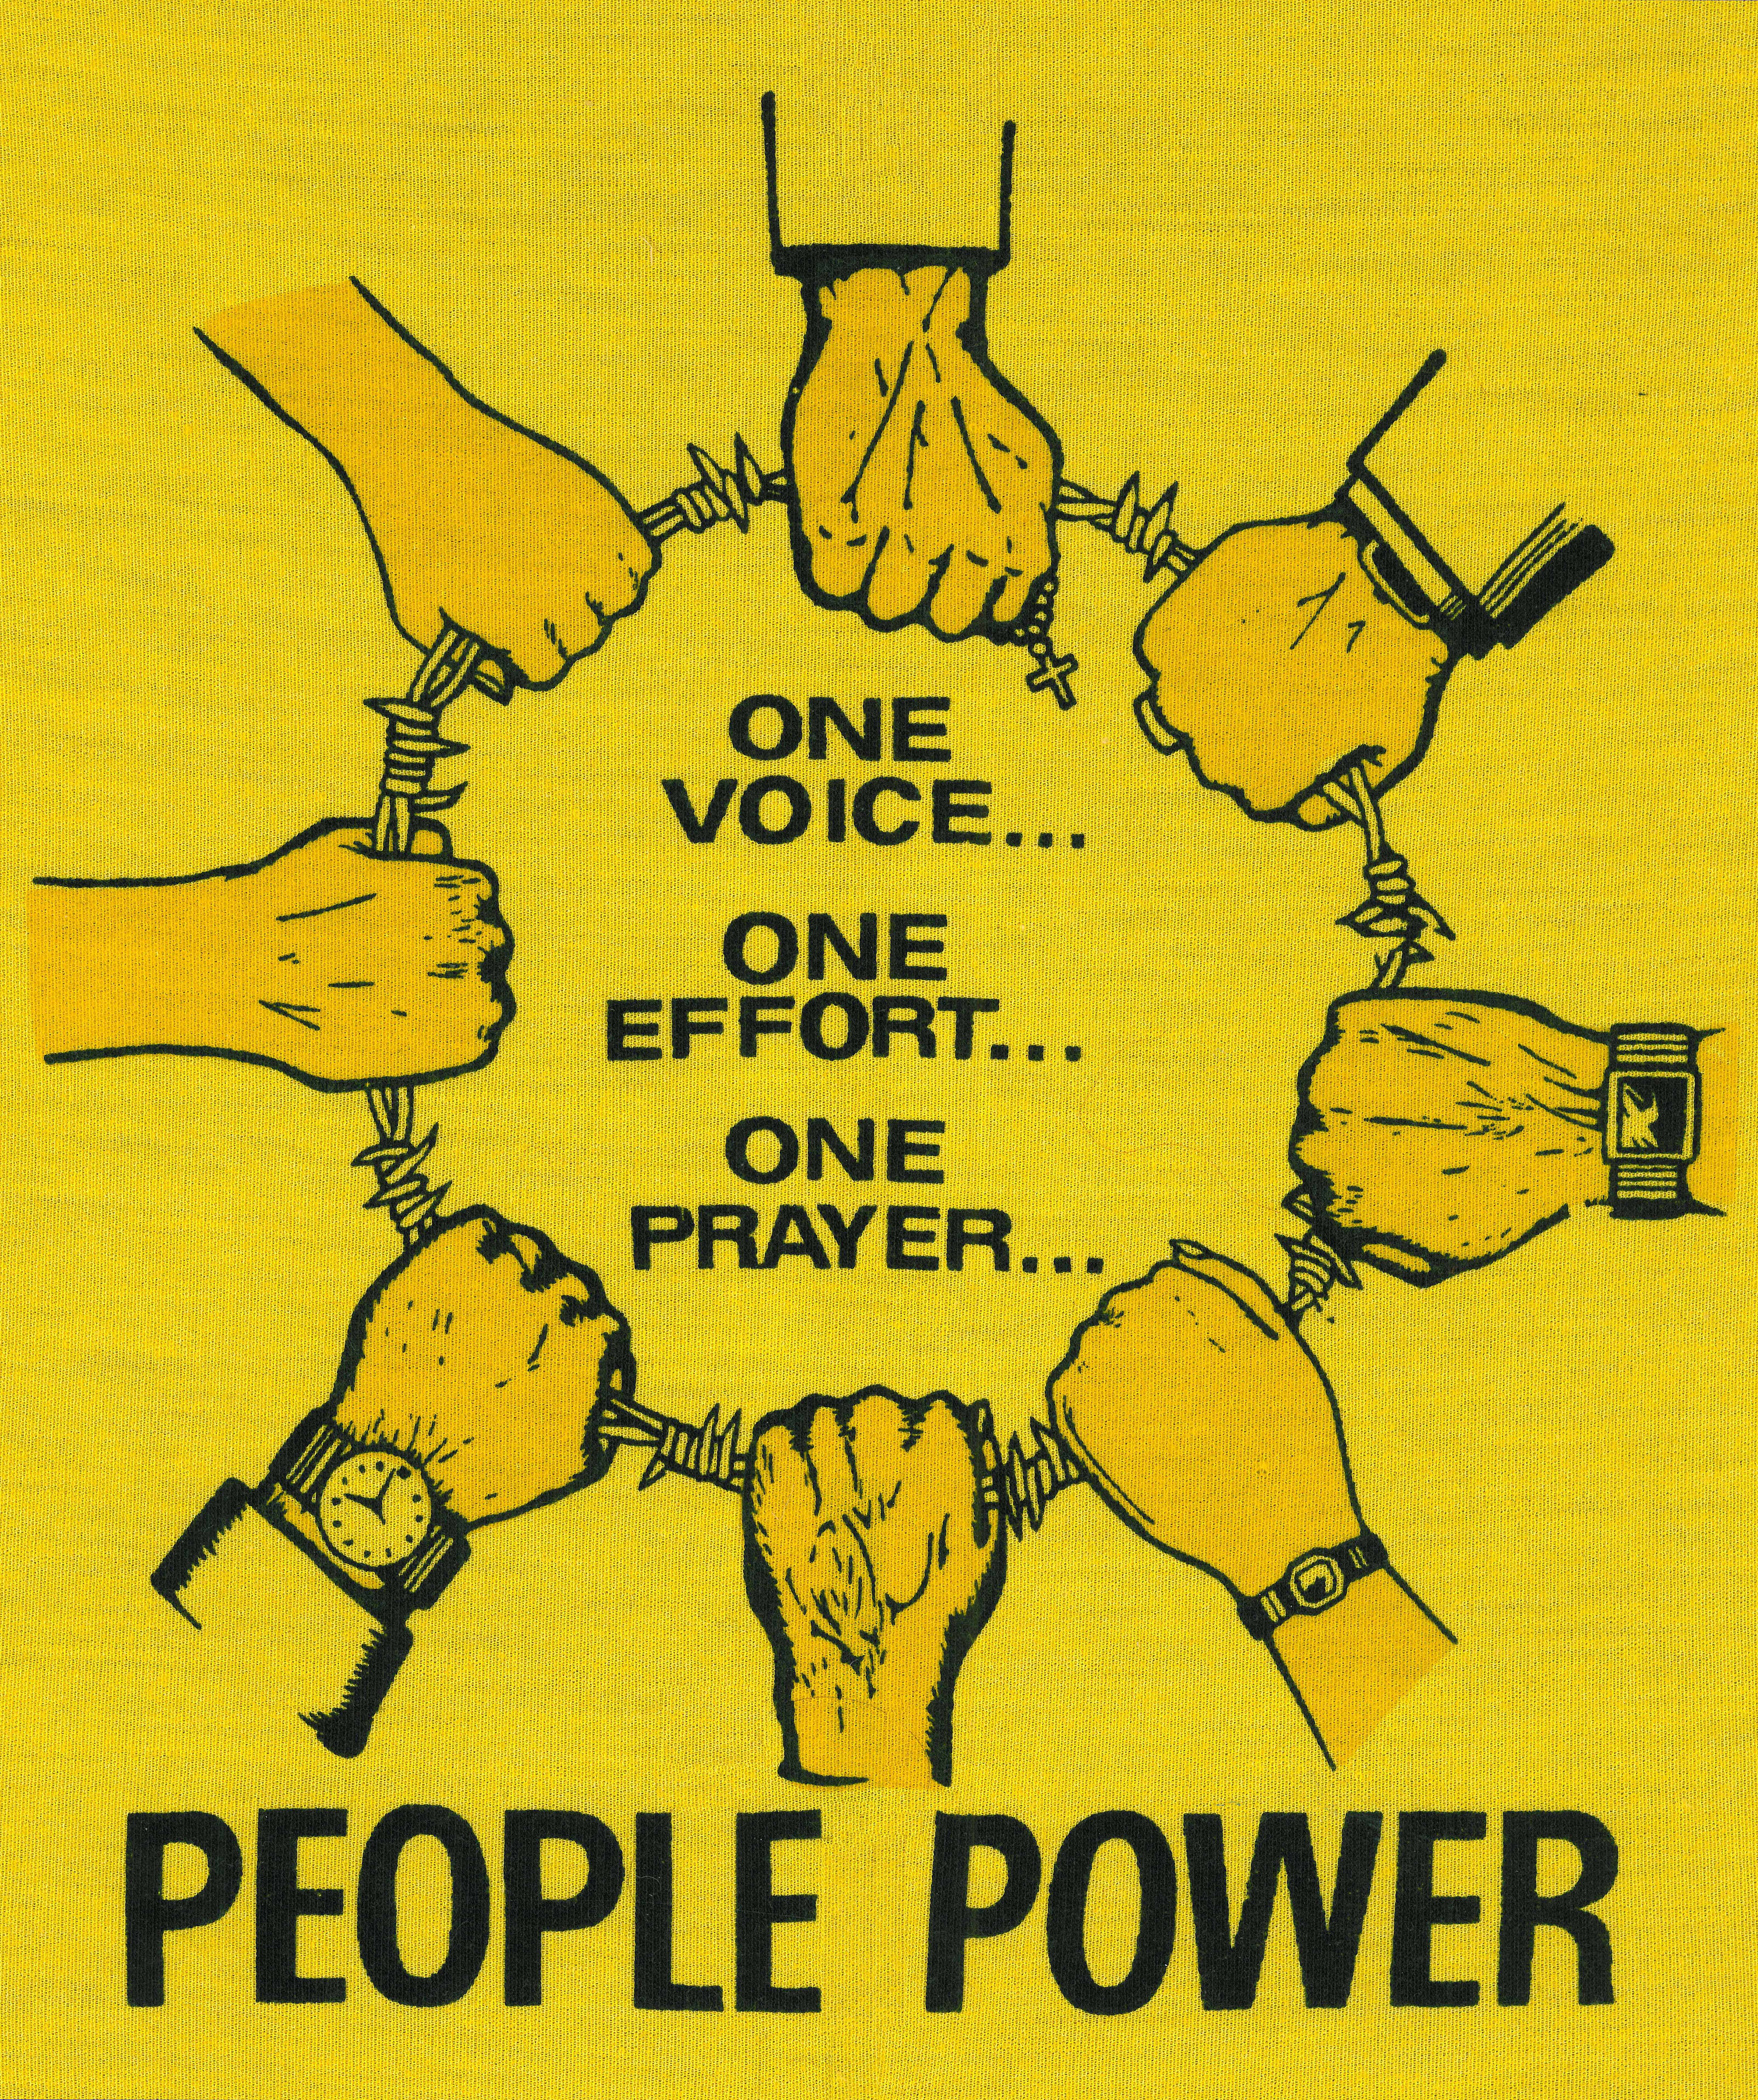 Revolution clipart people power More! People Power Edsa Revolution